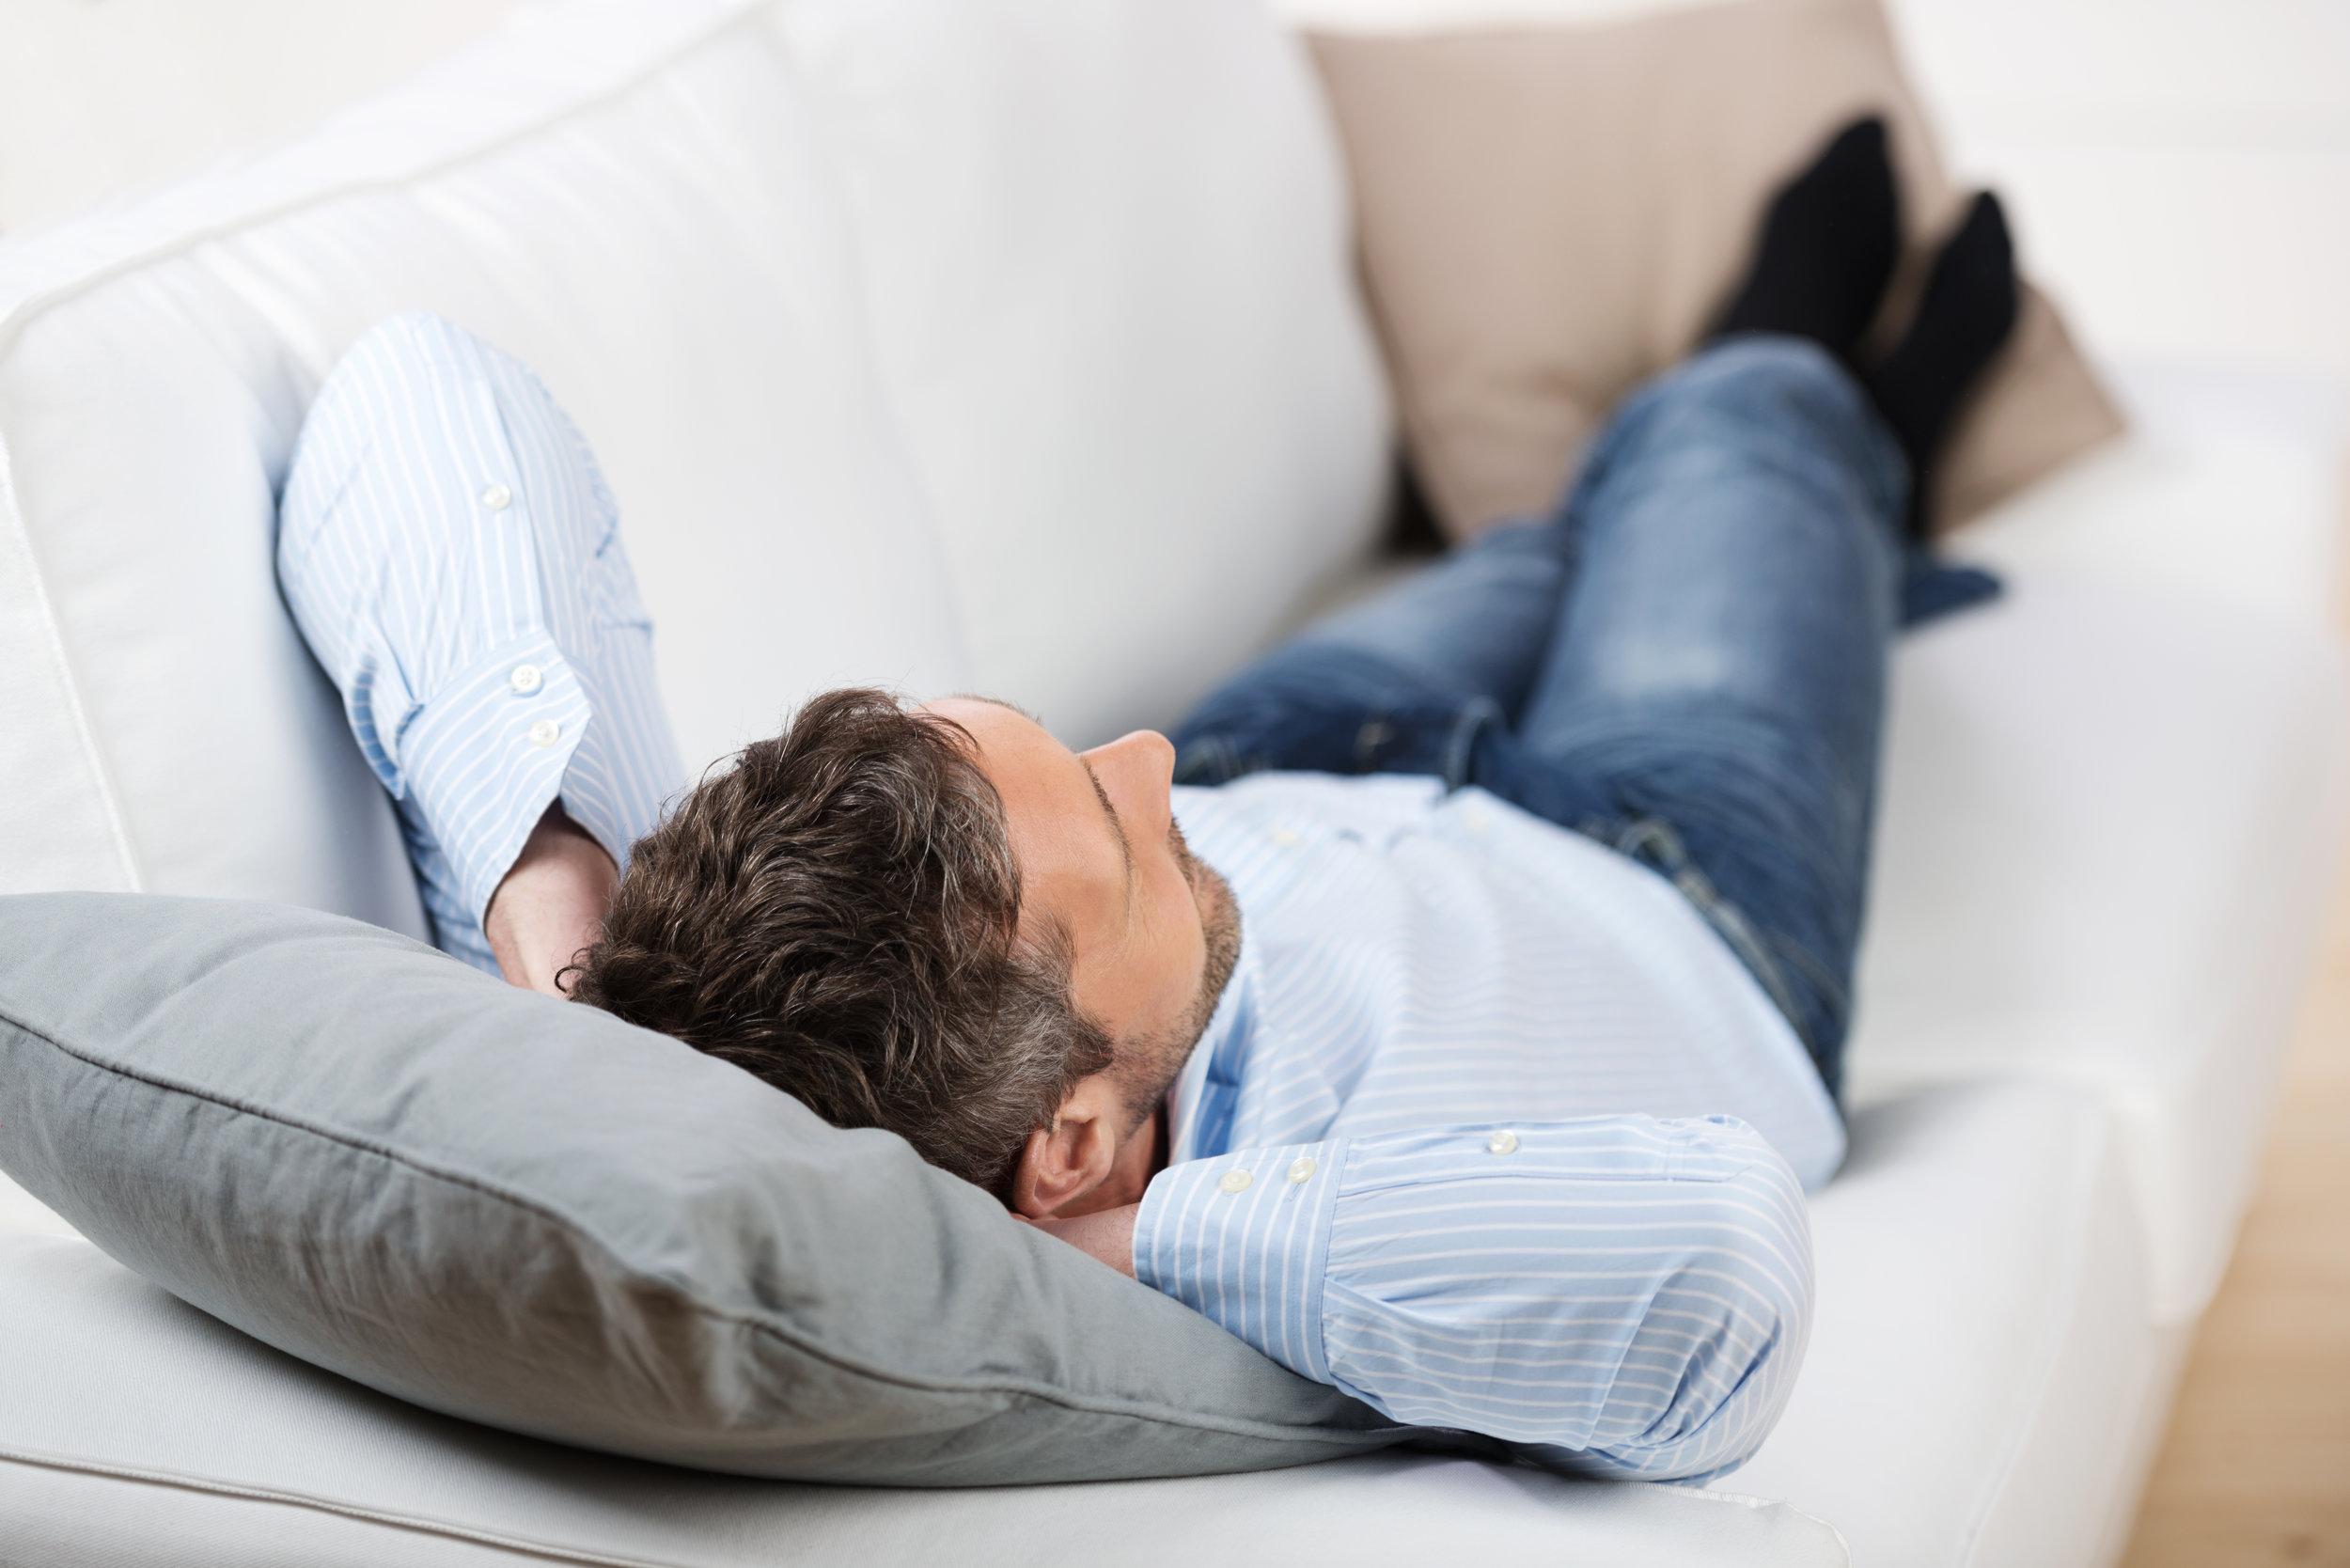 Man relaxing on sofa.jpeg